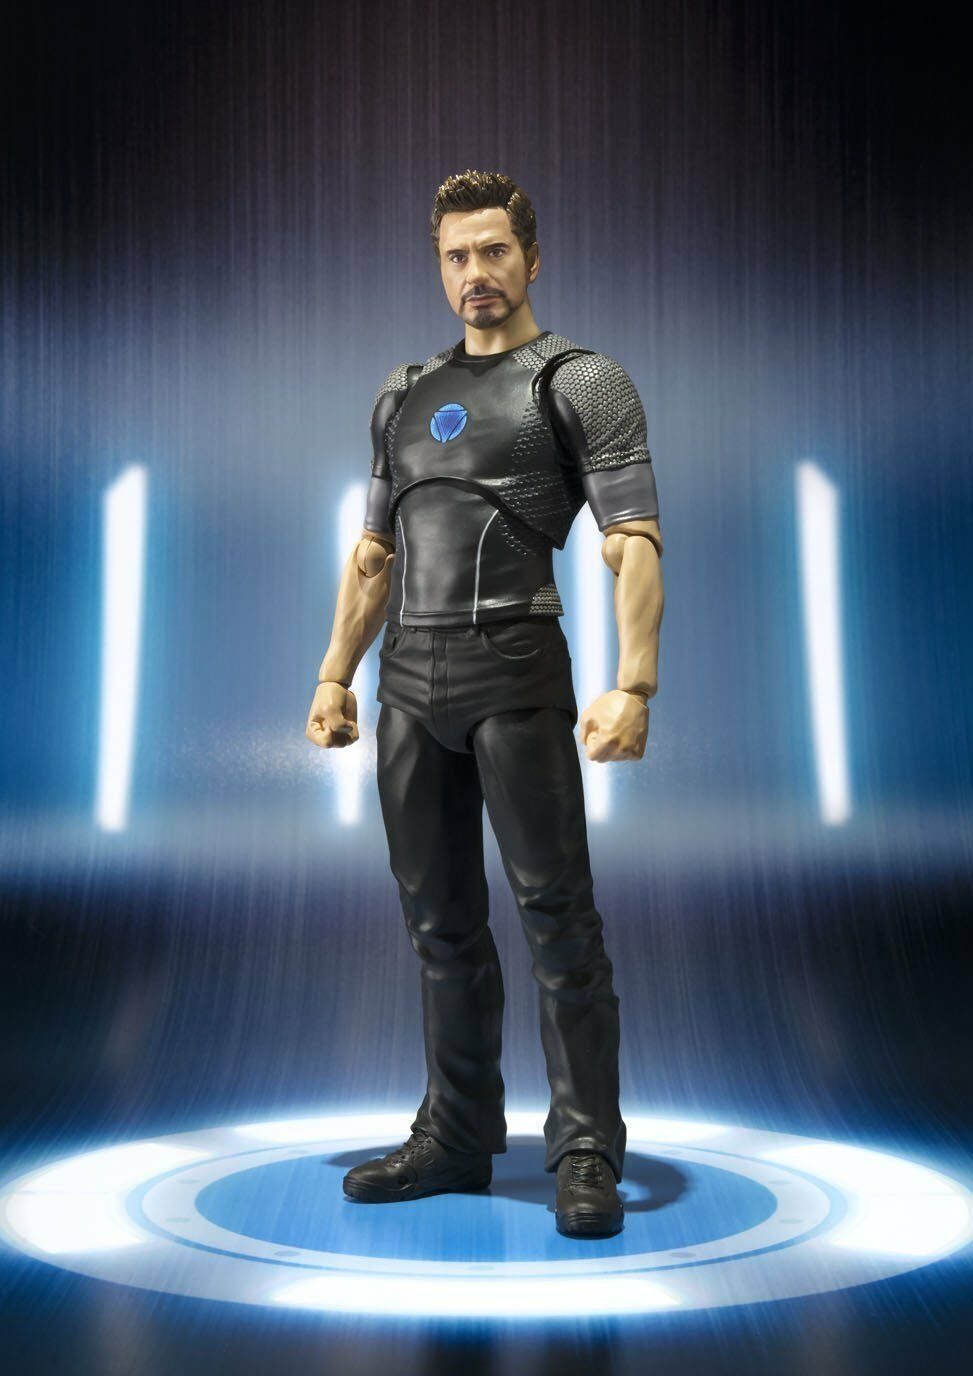 Bandai S.H. Figuarts Iron Man 3 Tony Estrellak versión japonesa